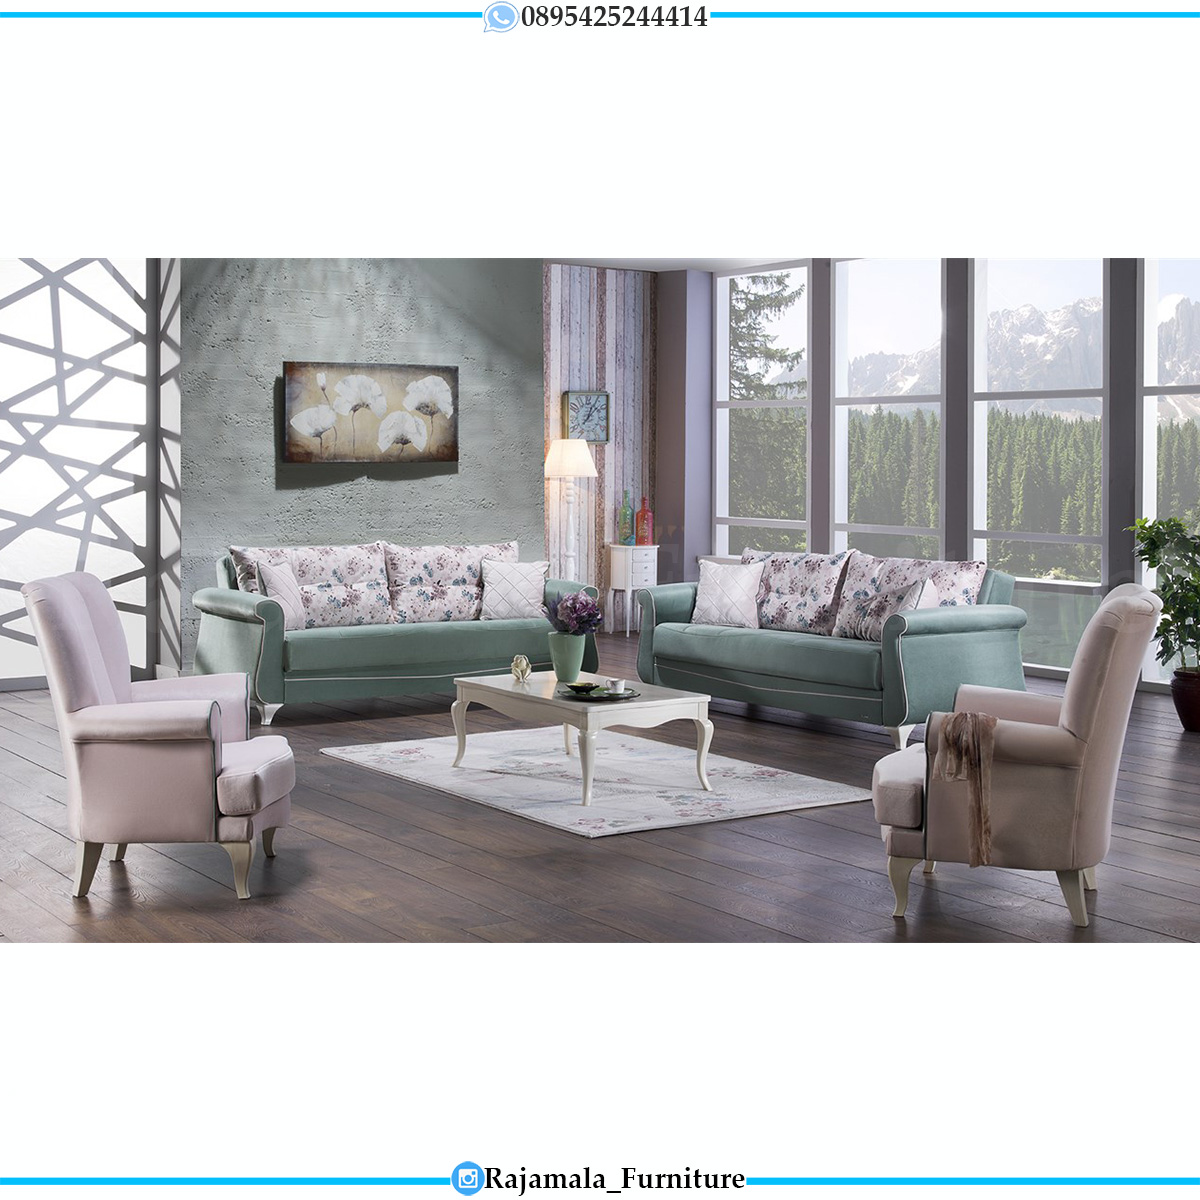 Sofa Tamu Minimalis Jepara Modern New Shabby Design RM-737